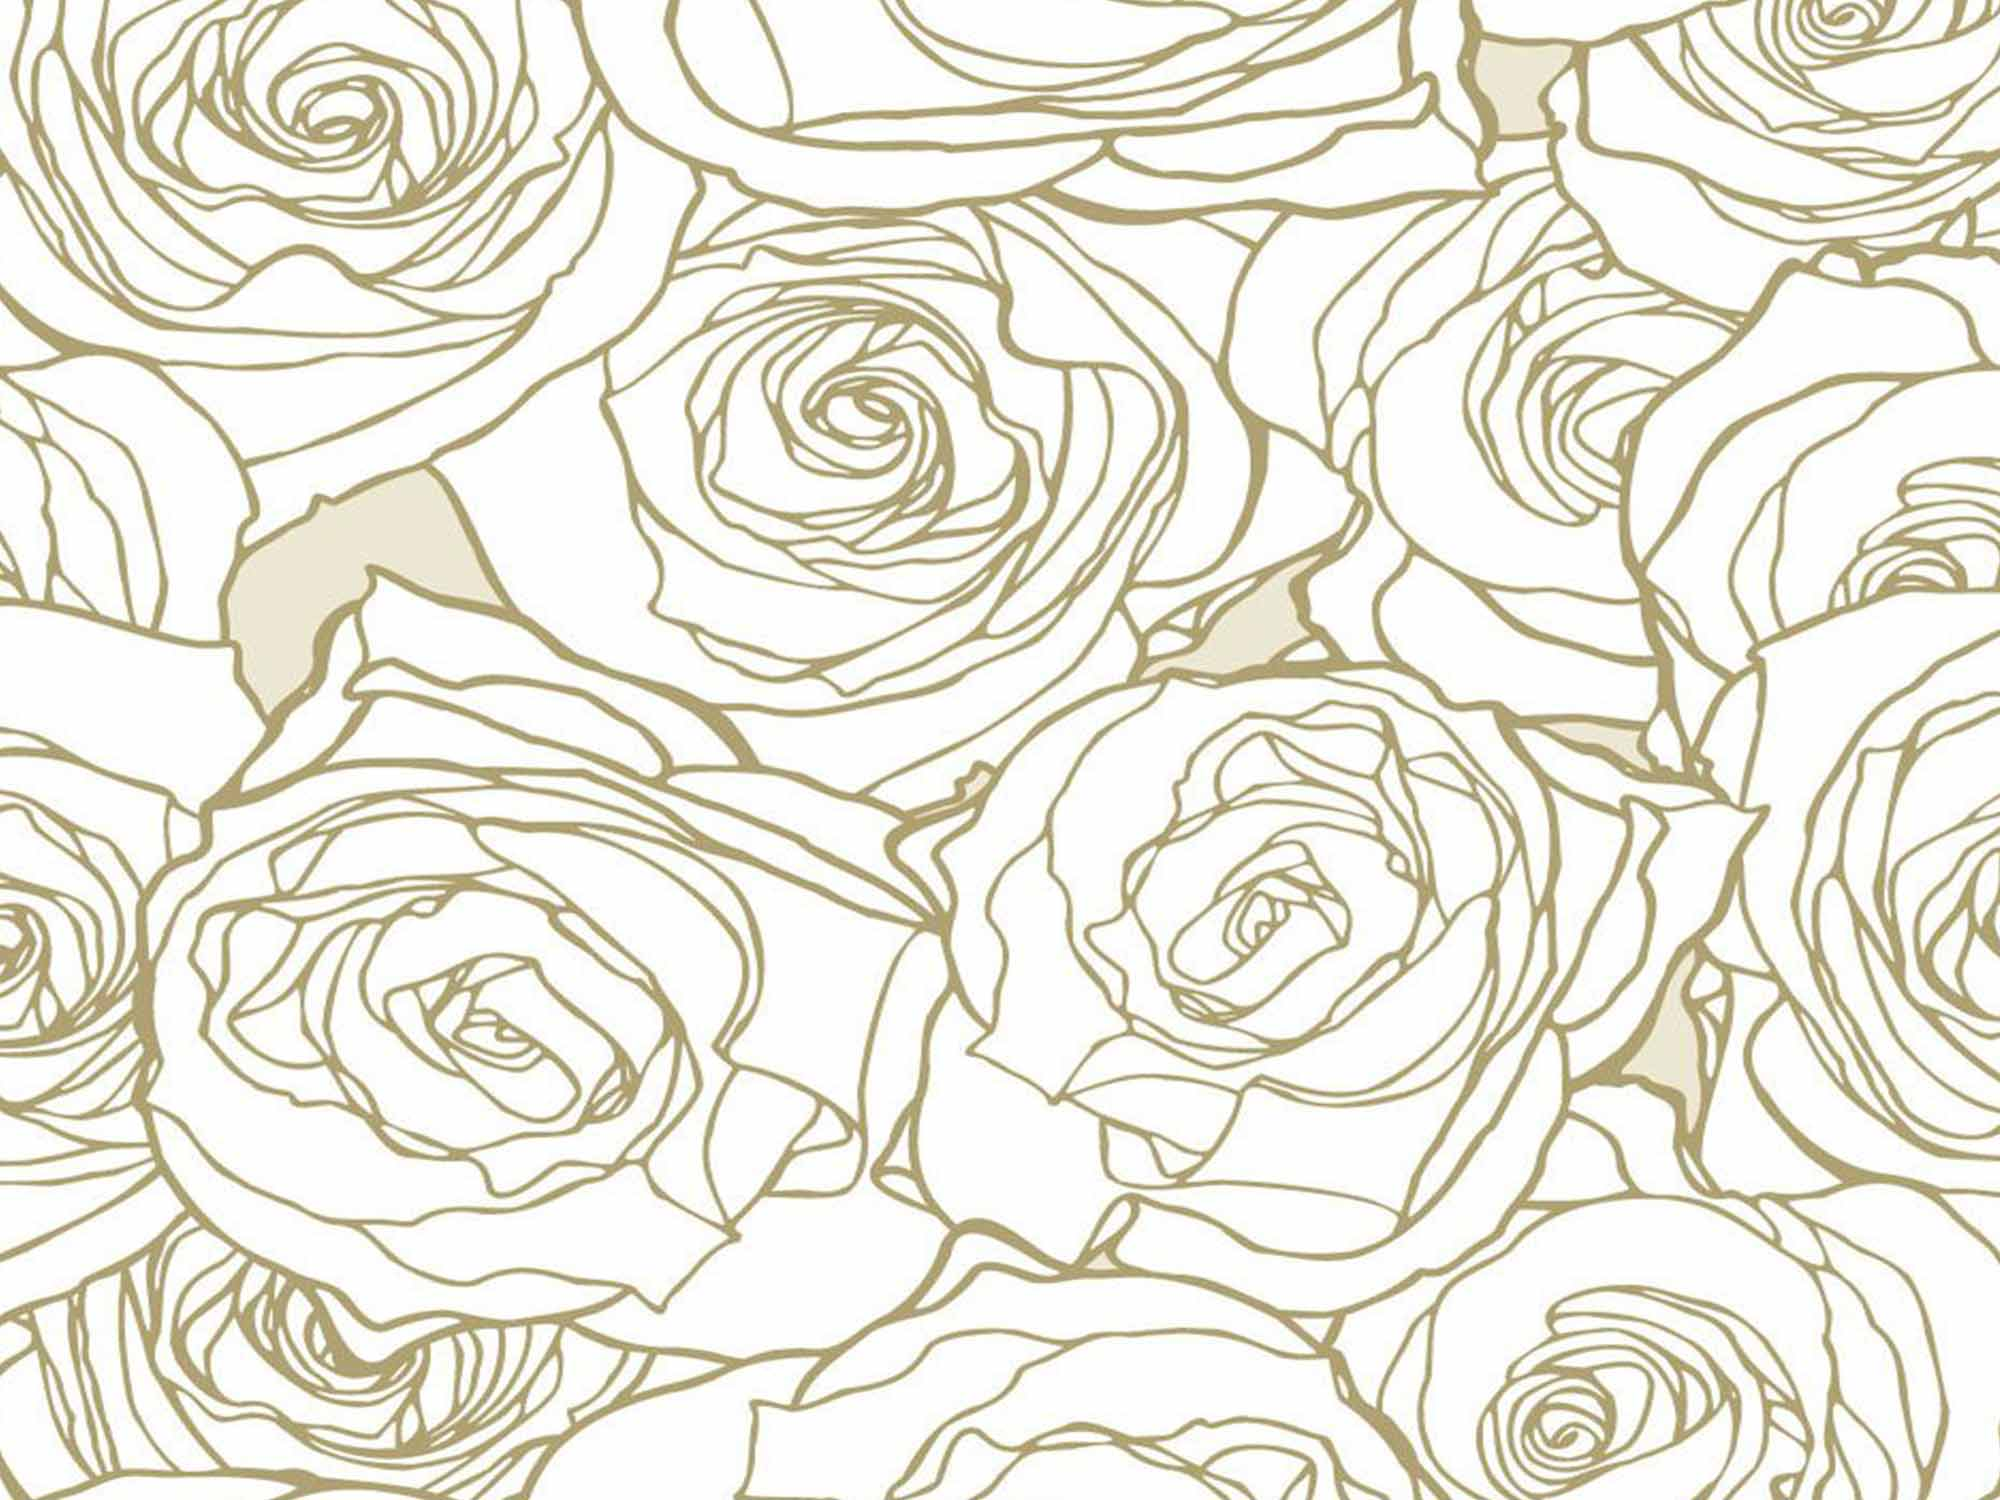 Papel de Parede Floral 0048 - Adesivos de Parede  - Paredes Decoradas